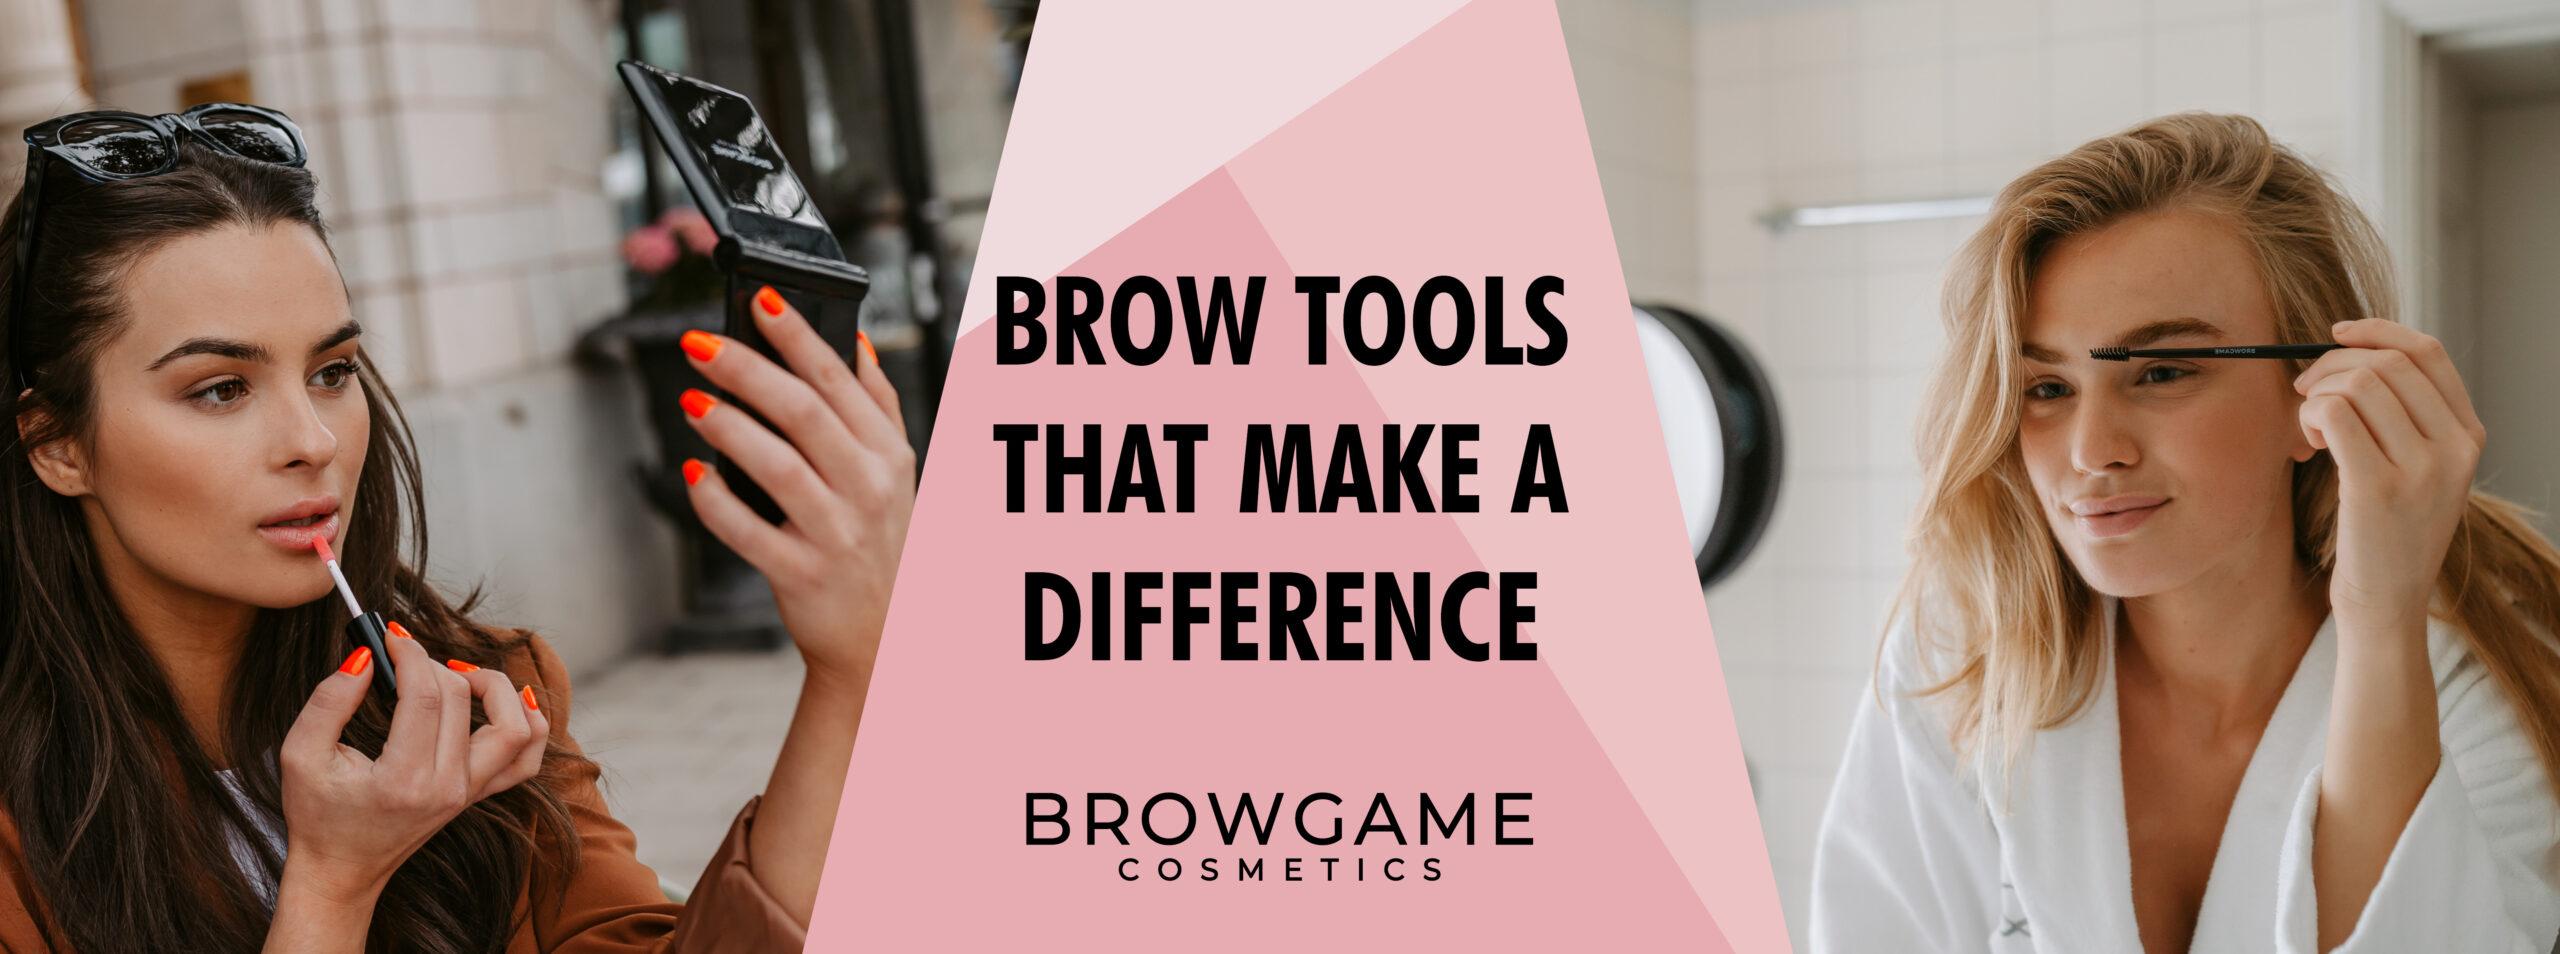 Browgame Cosmetics